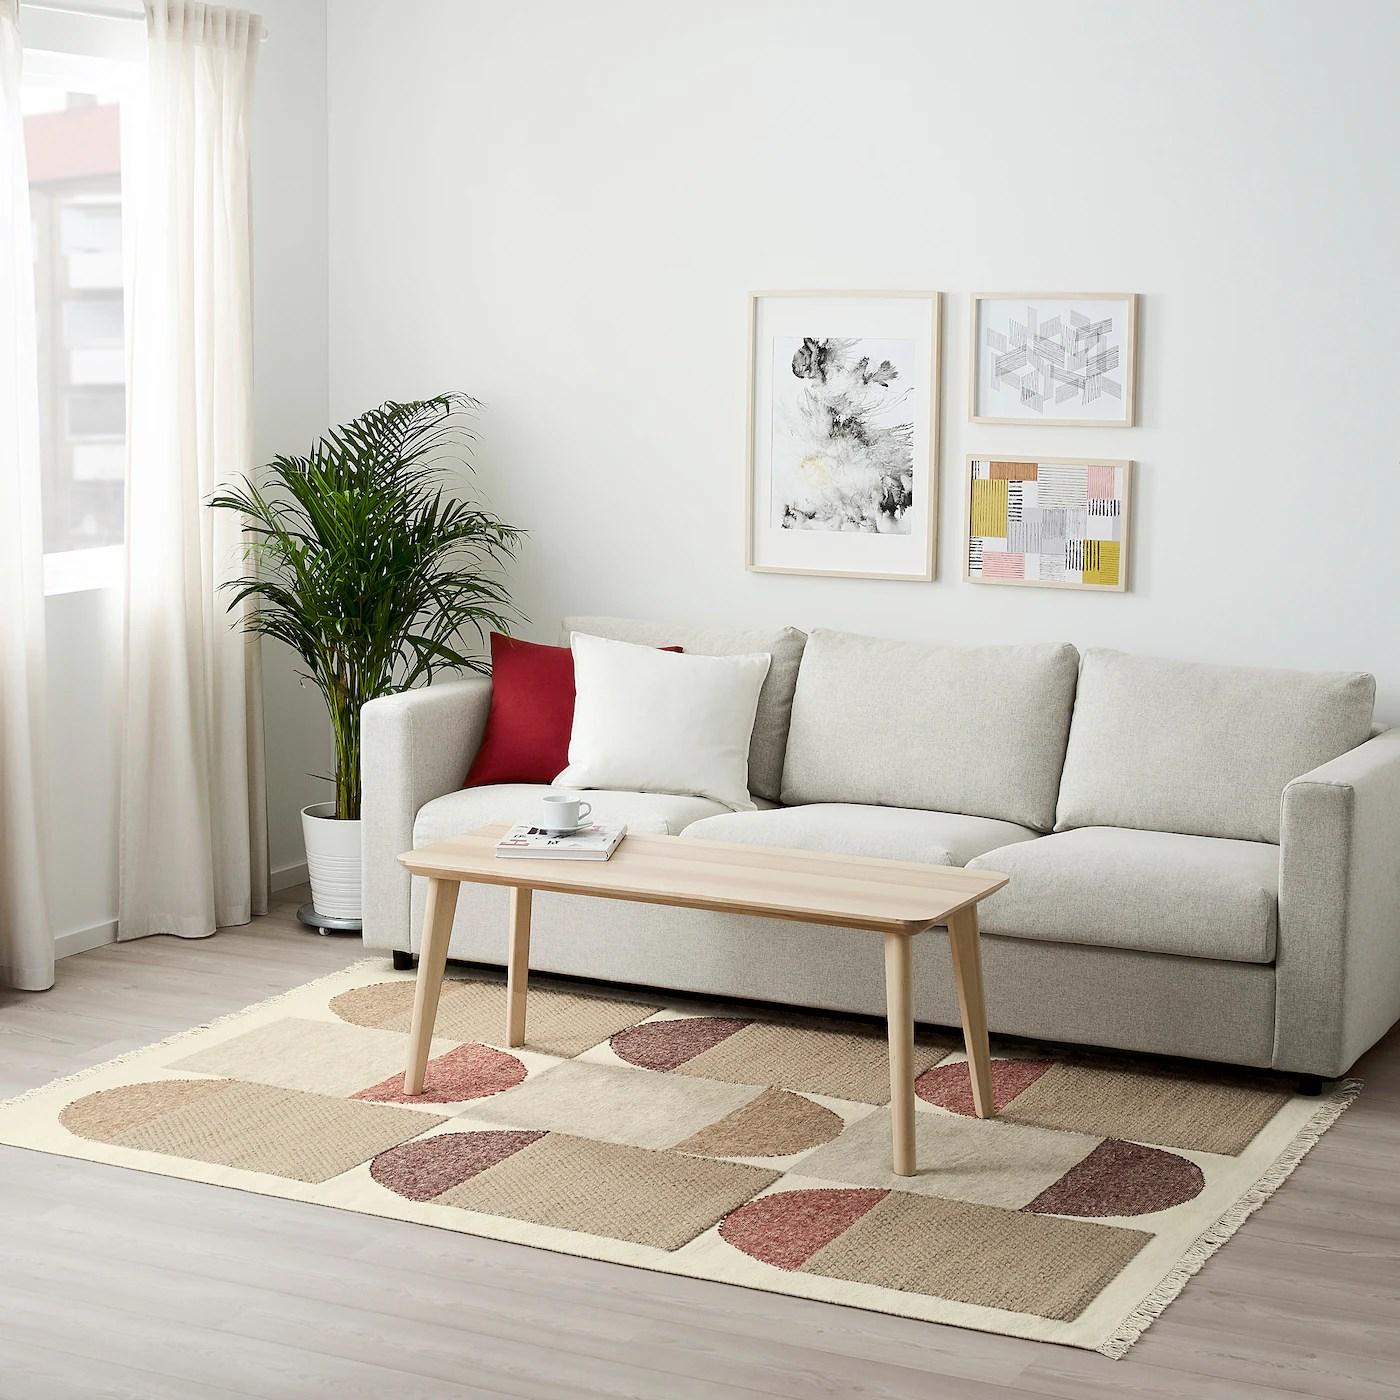 Spangsbro Taeppe Fladvaevet Handlavet Multifarvet Ikea